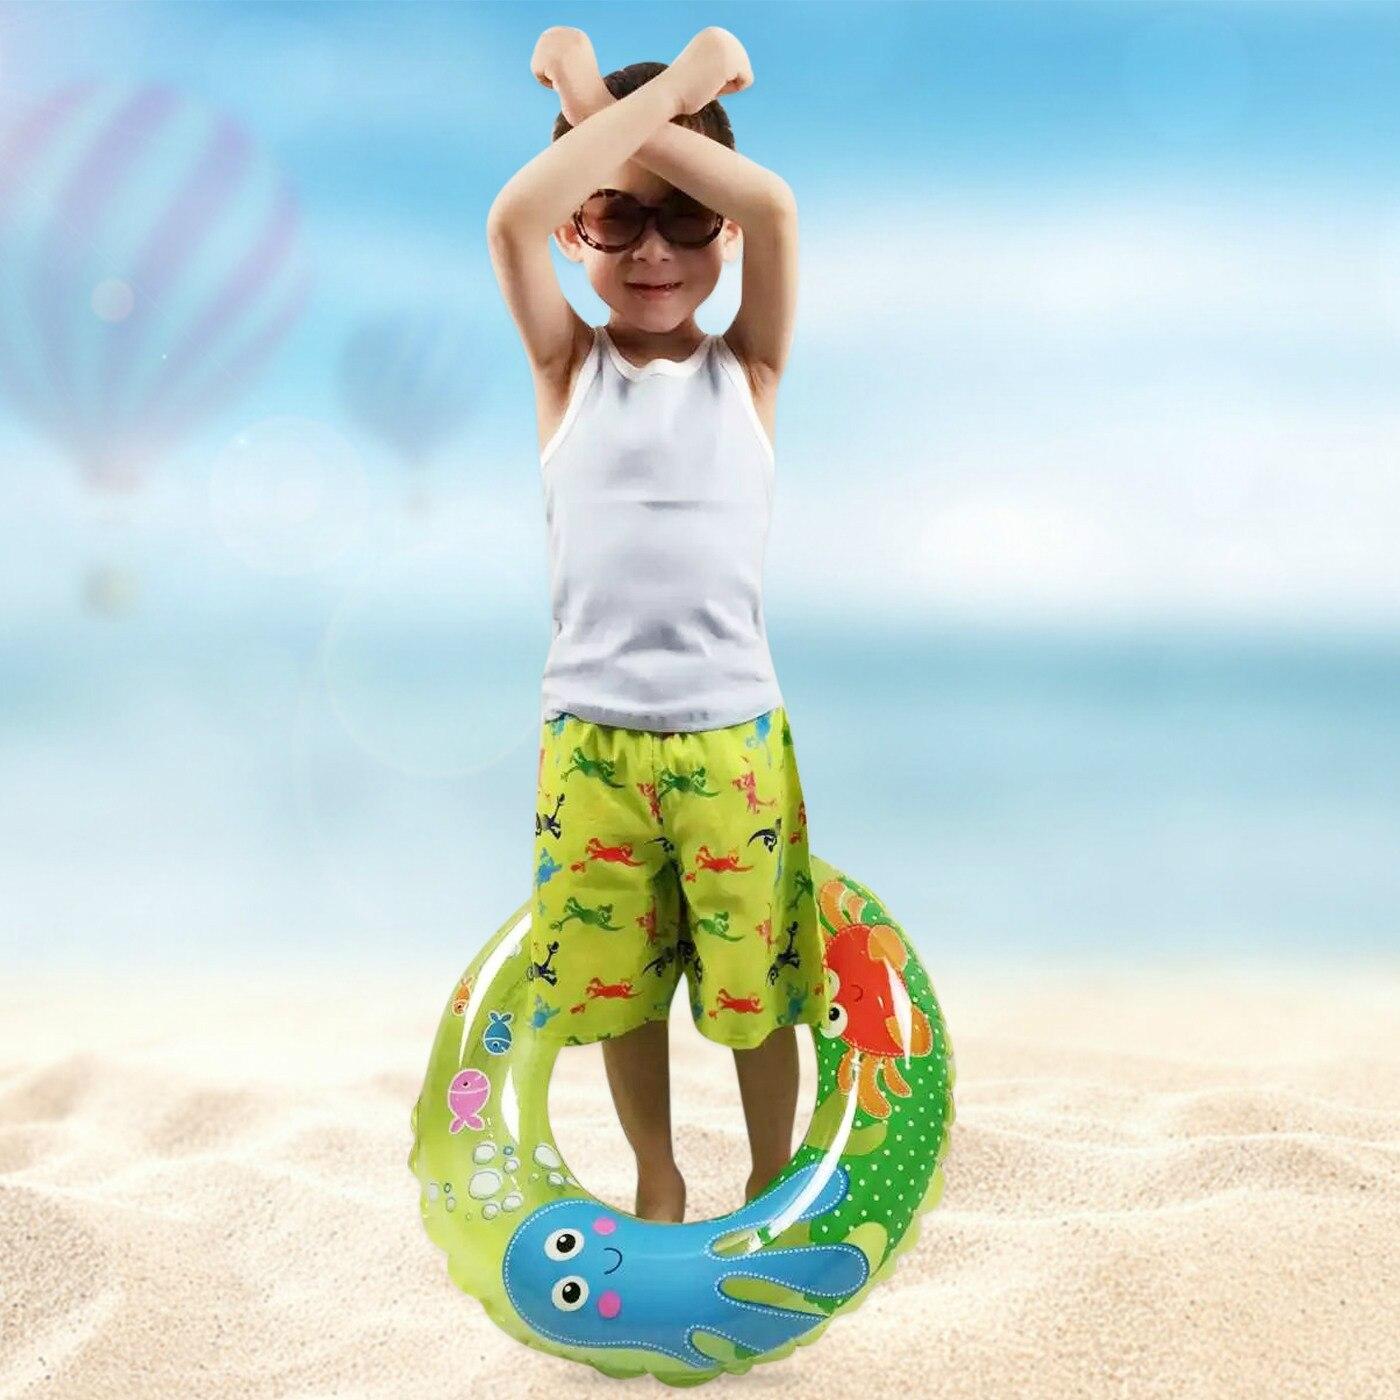 Kids' Beach Shorts Asian Tassel Printed Jin Urethane Elastic Fibre BOY'S With Of Her Drawers Beach Shorts BOY'S Boutique Beach S